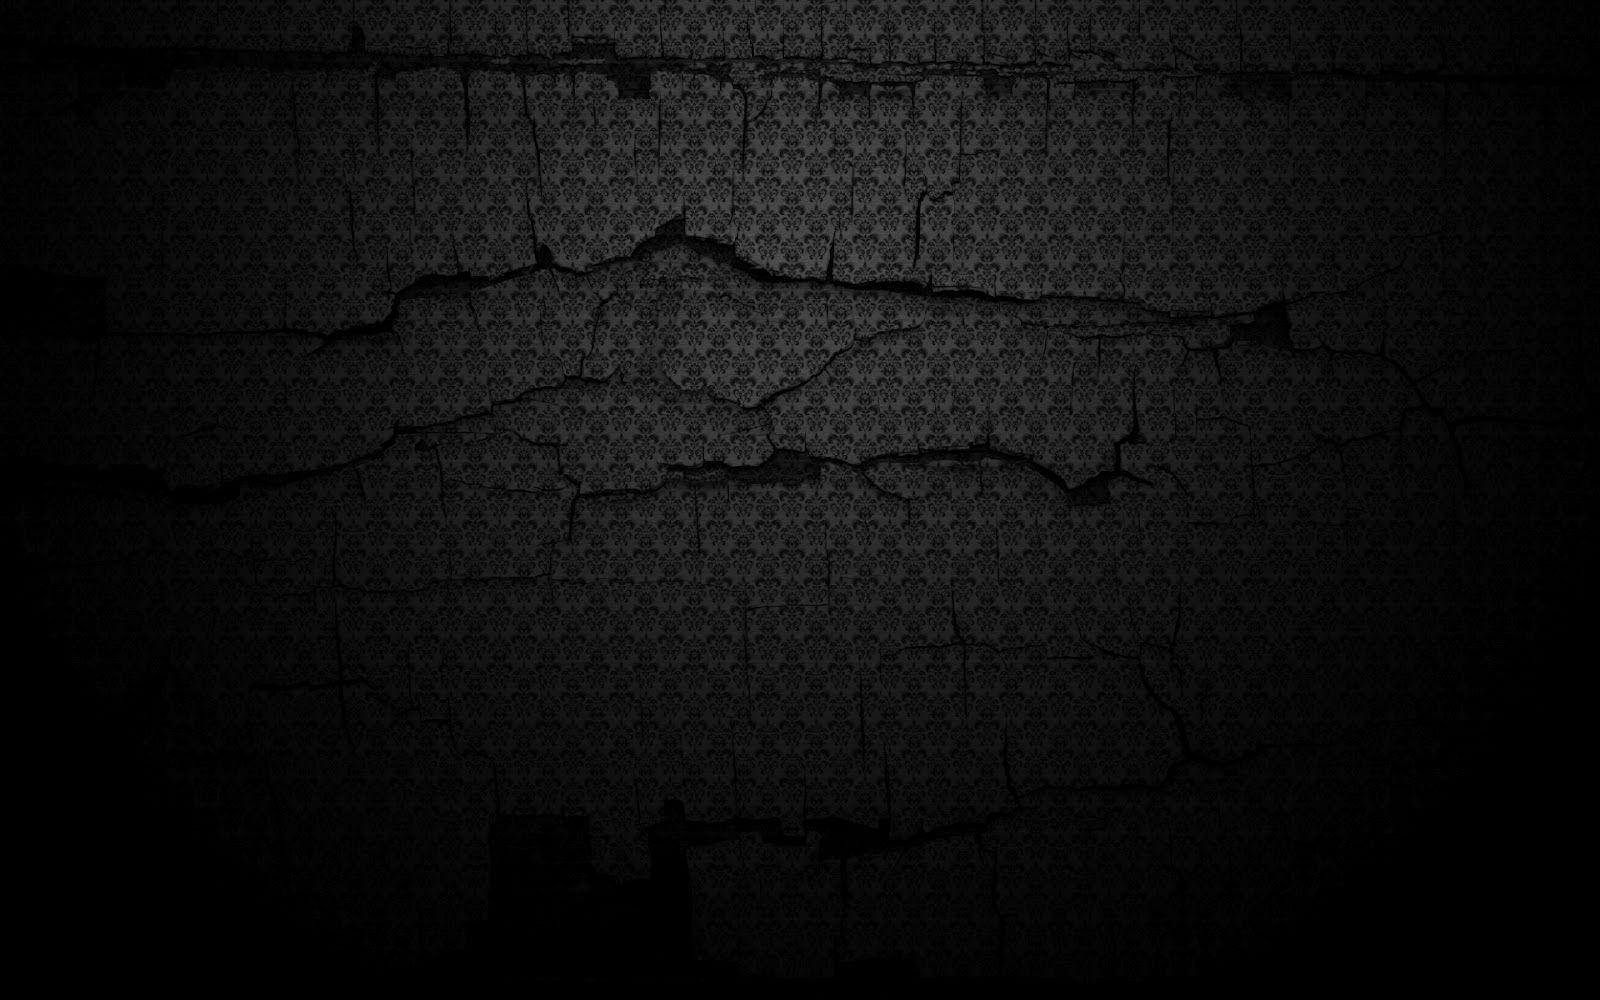 background Xample2